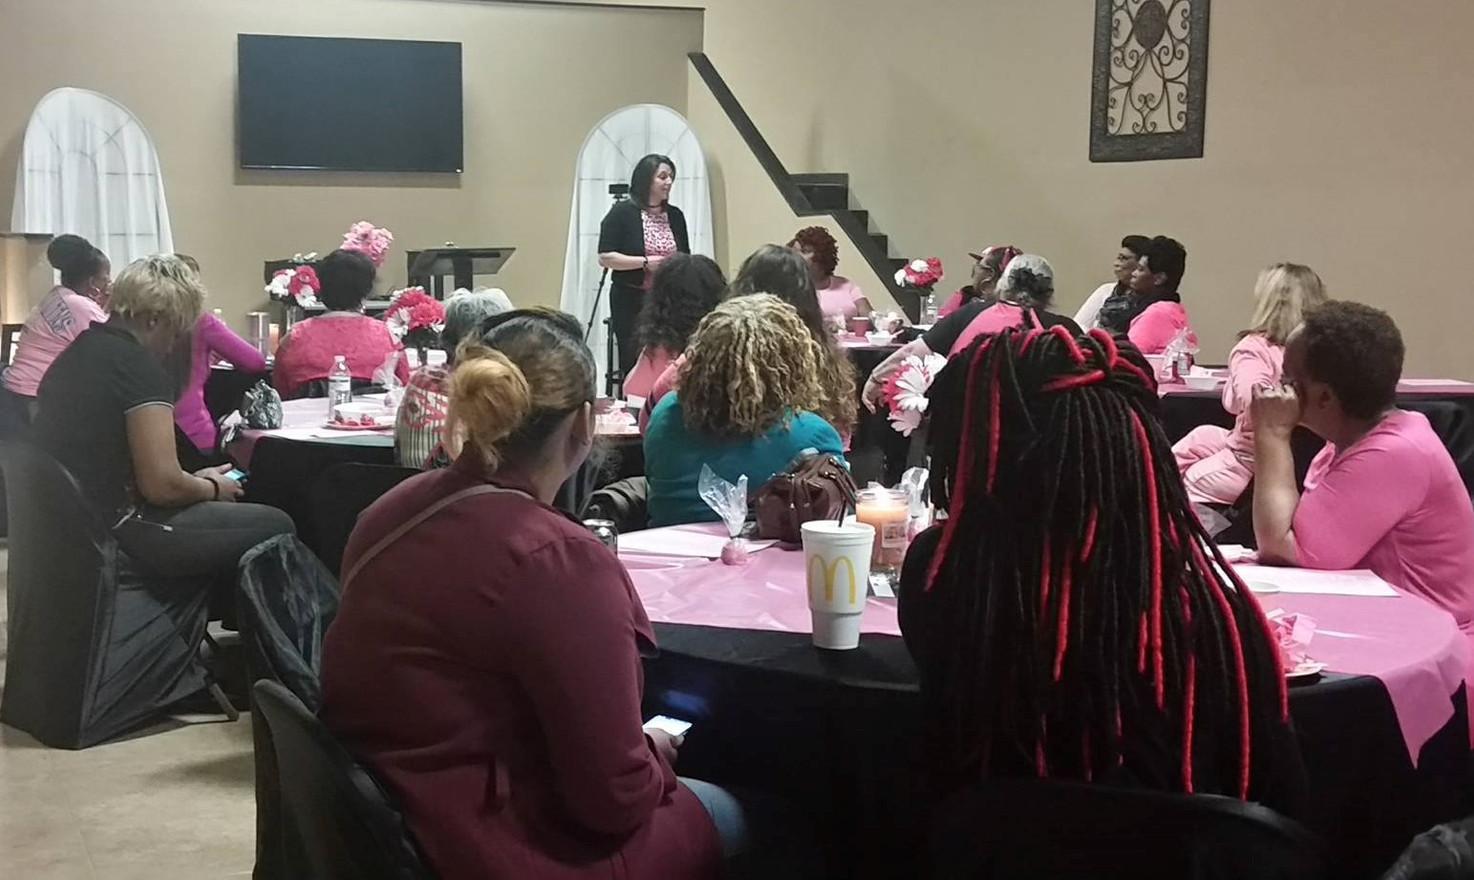 Jennifer Rash speaking at New Life Deliverance Worship Center in Spartanburg, SC